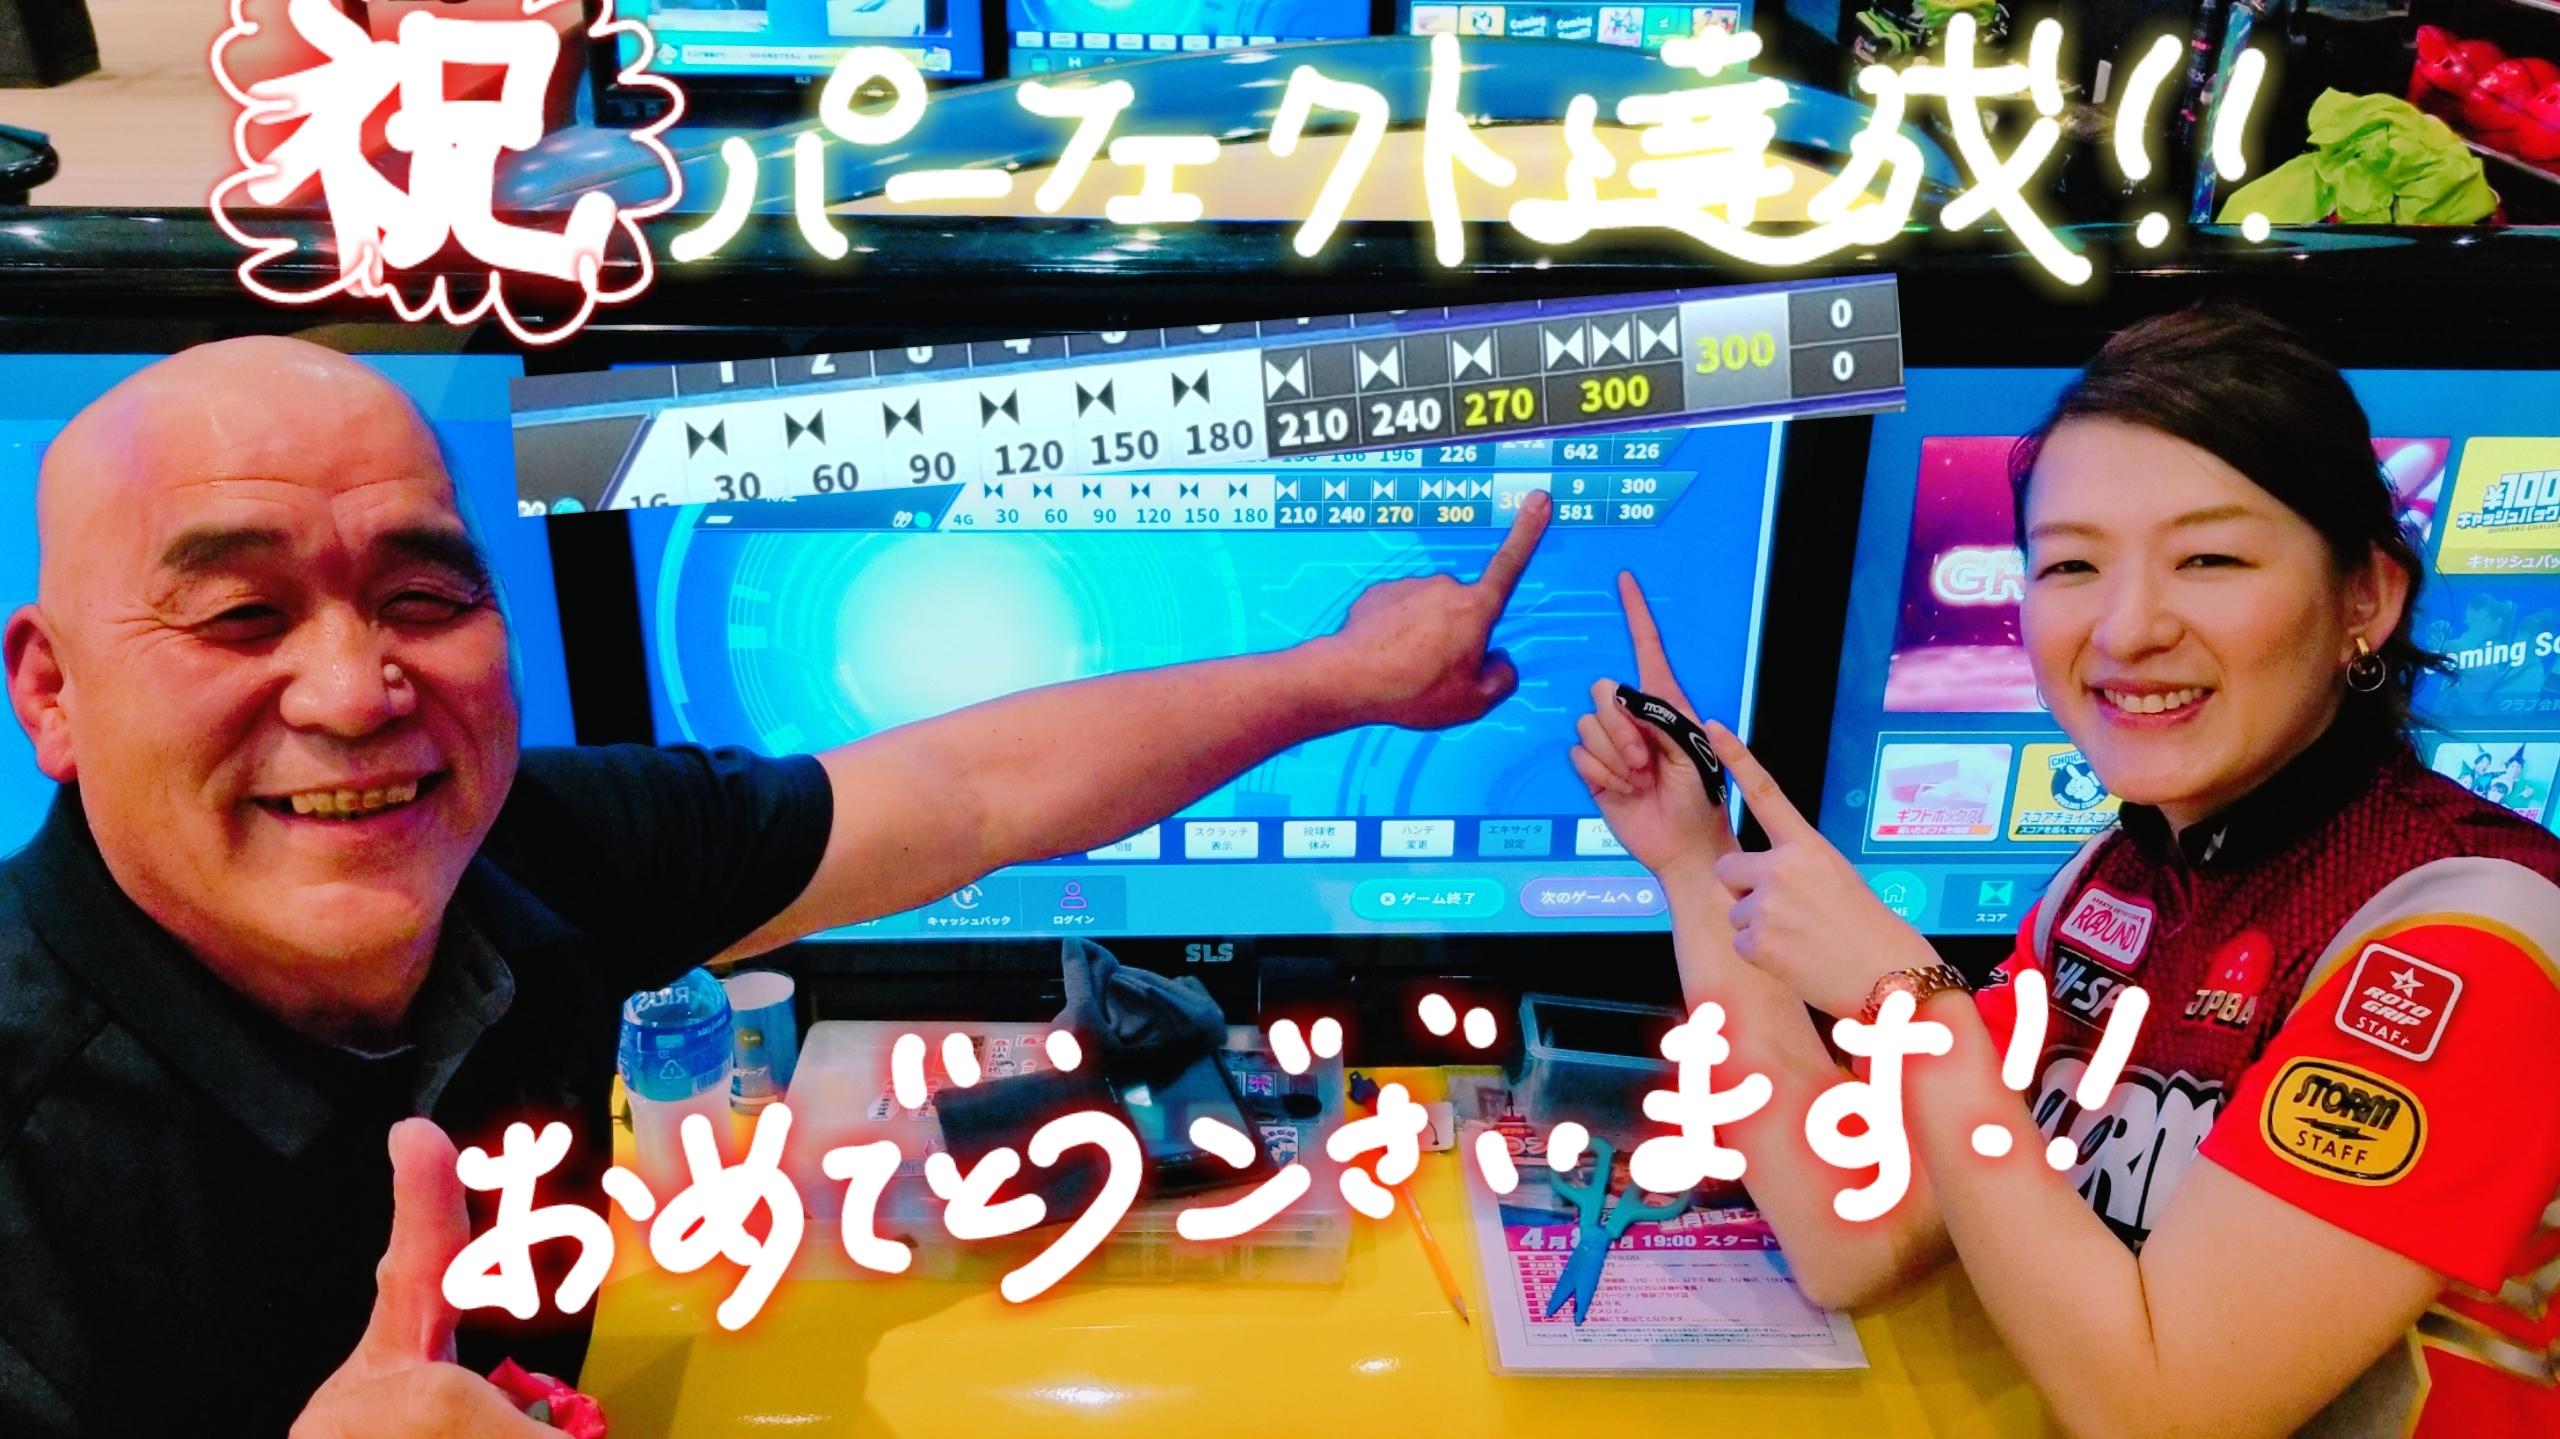 19-04-07-20-00-06-518_deco.jpg